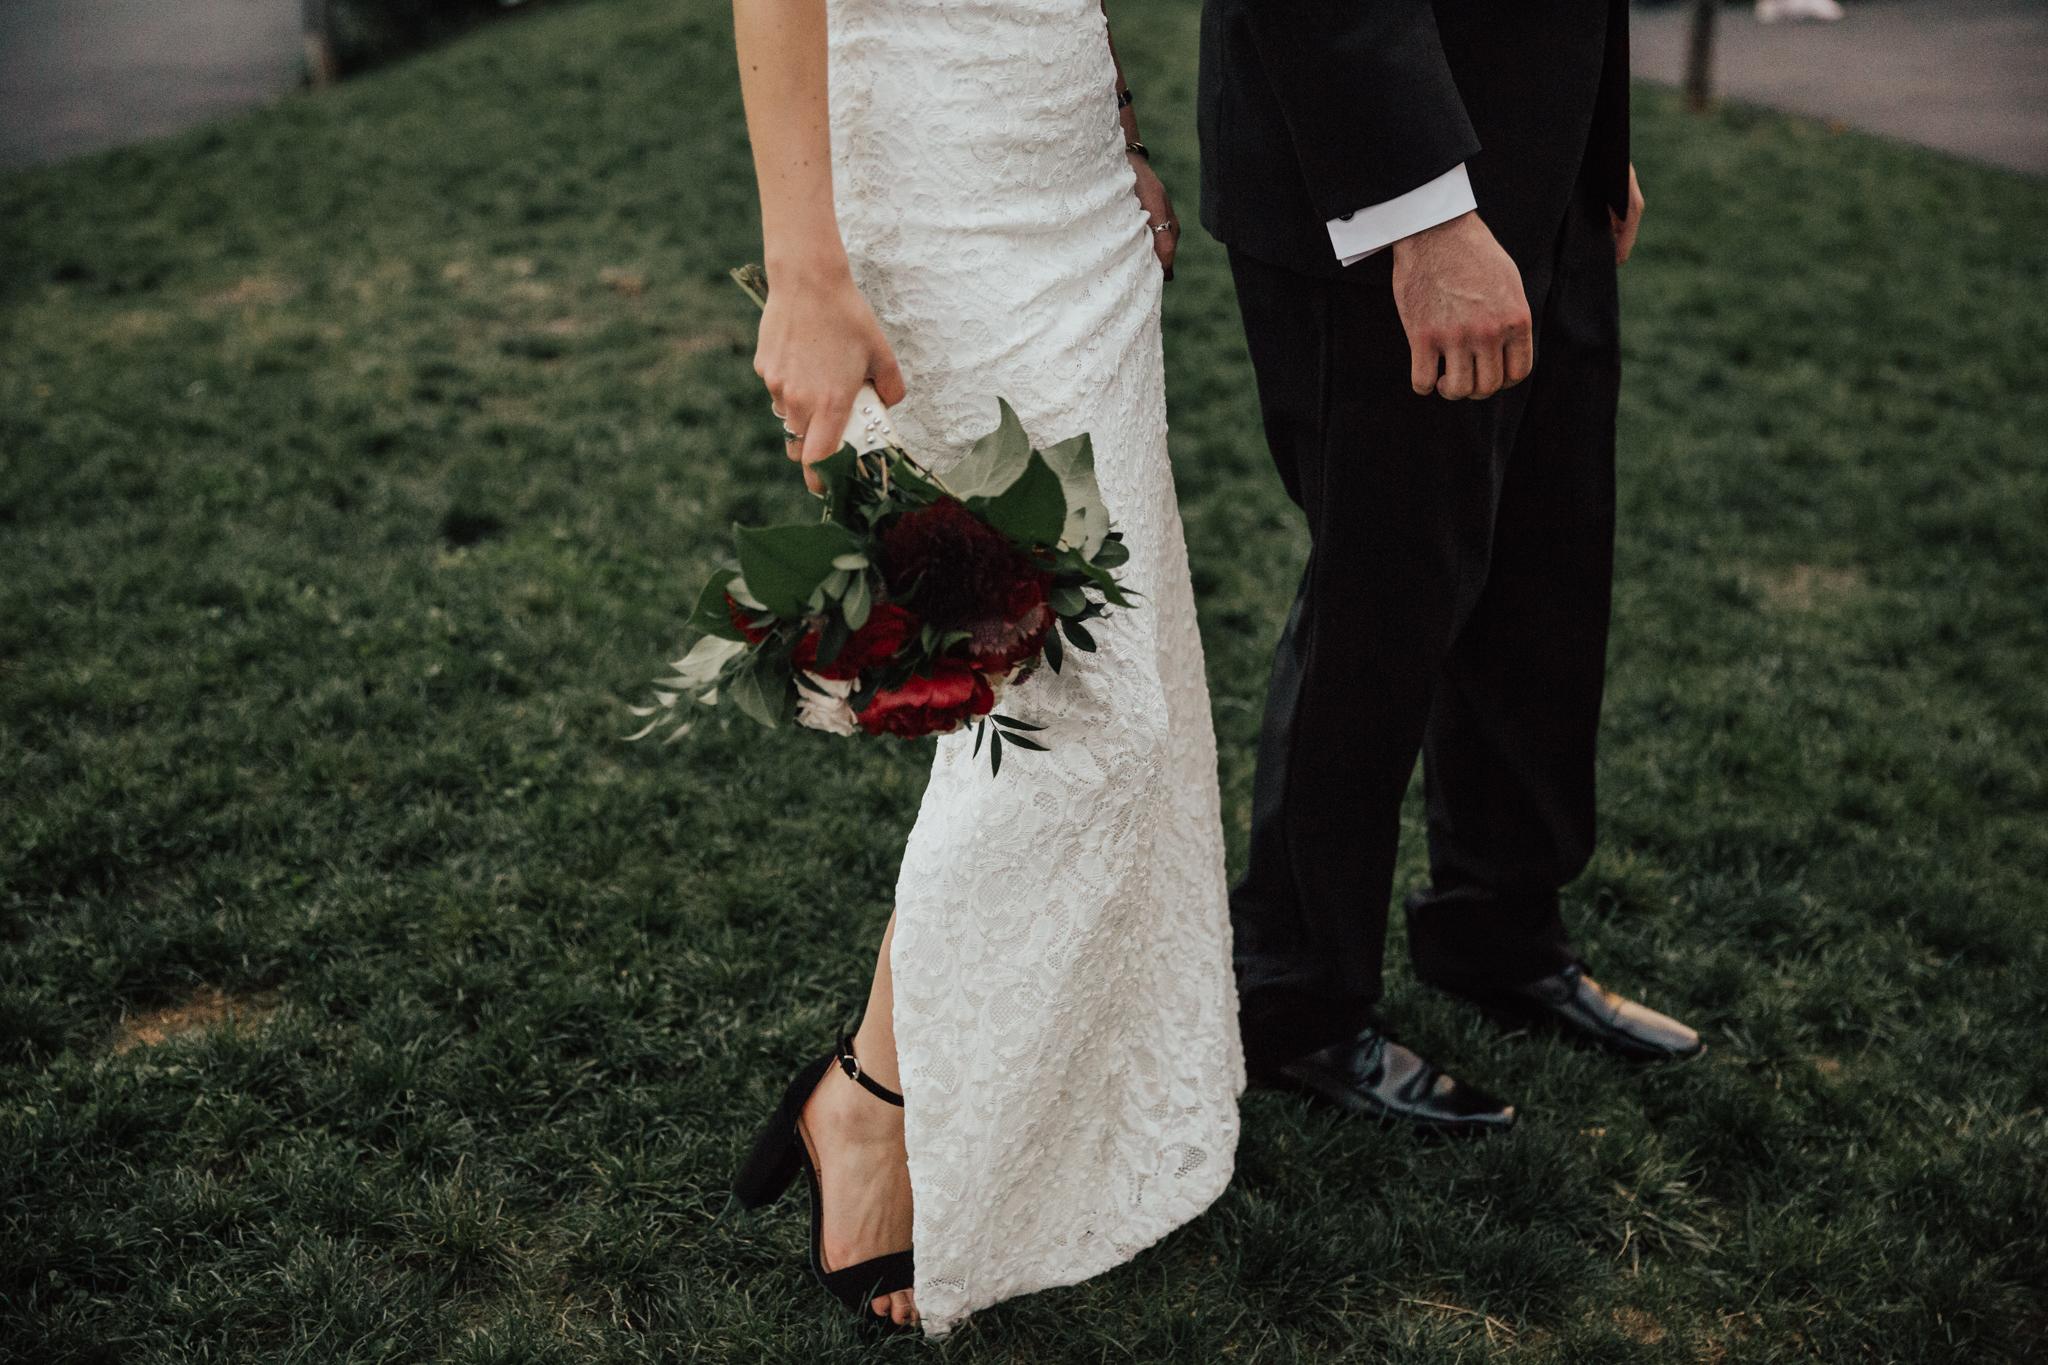 26-bridge-wedding-brooklyn-061.JPG